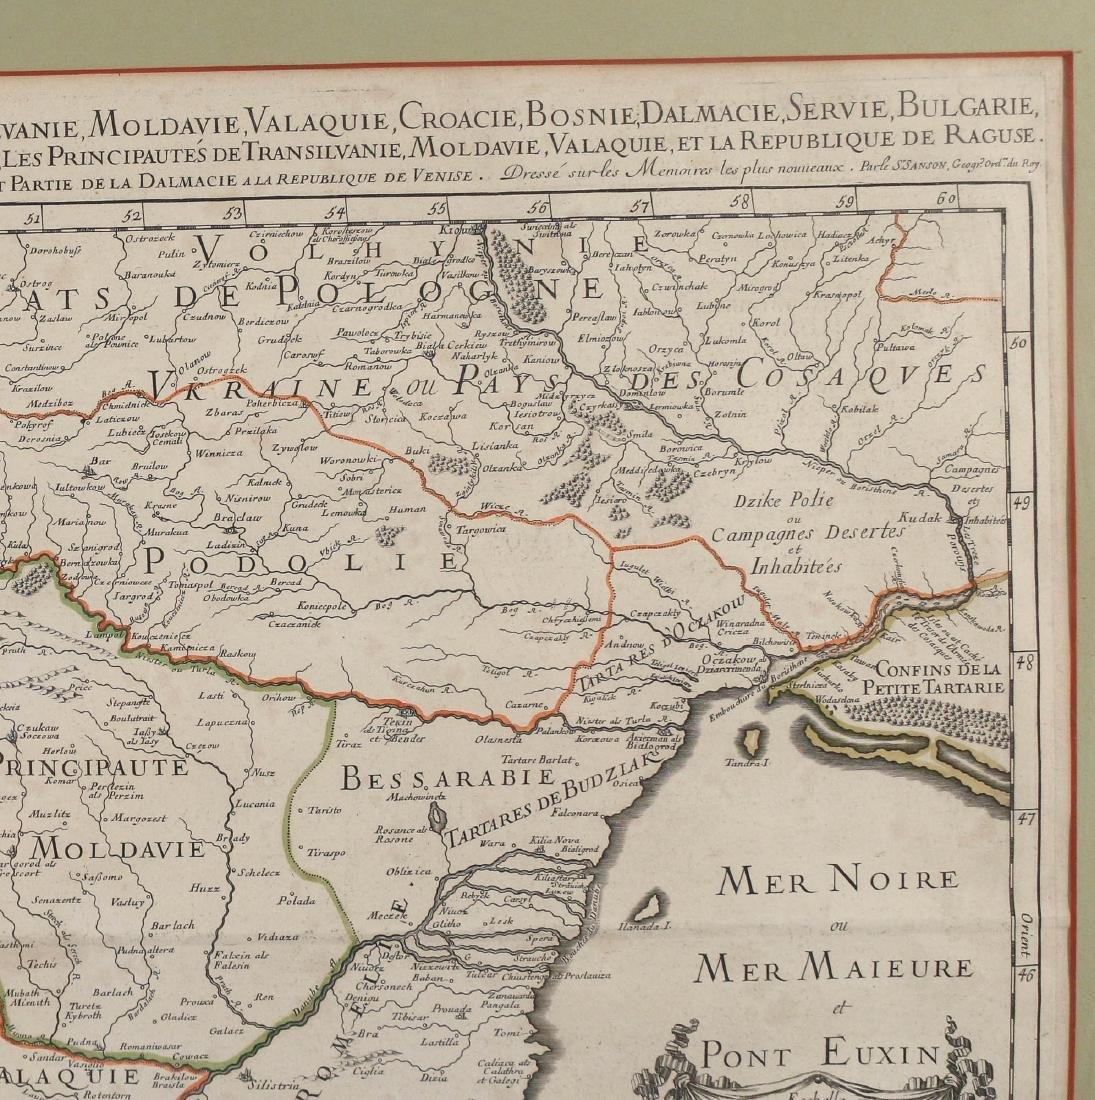 [JAILLOT] MAP OF HUNGARY & SURROUNDINGS - 4